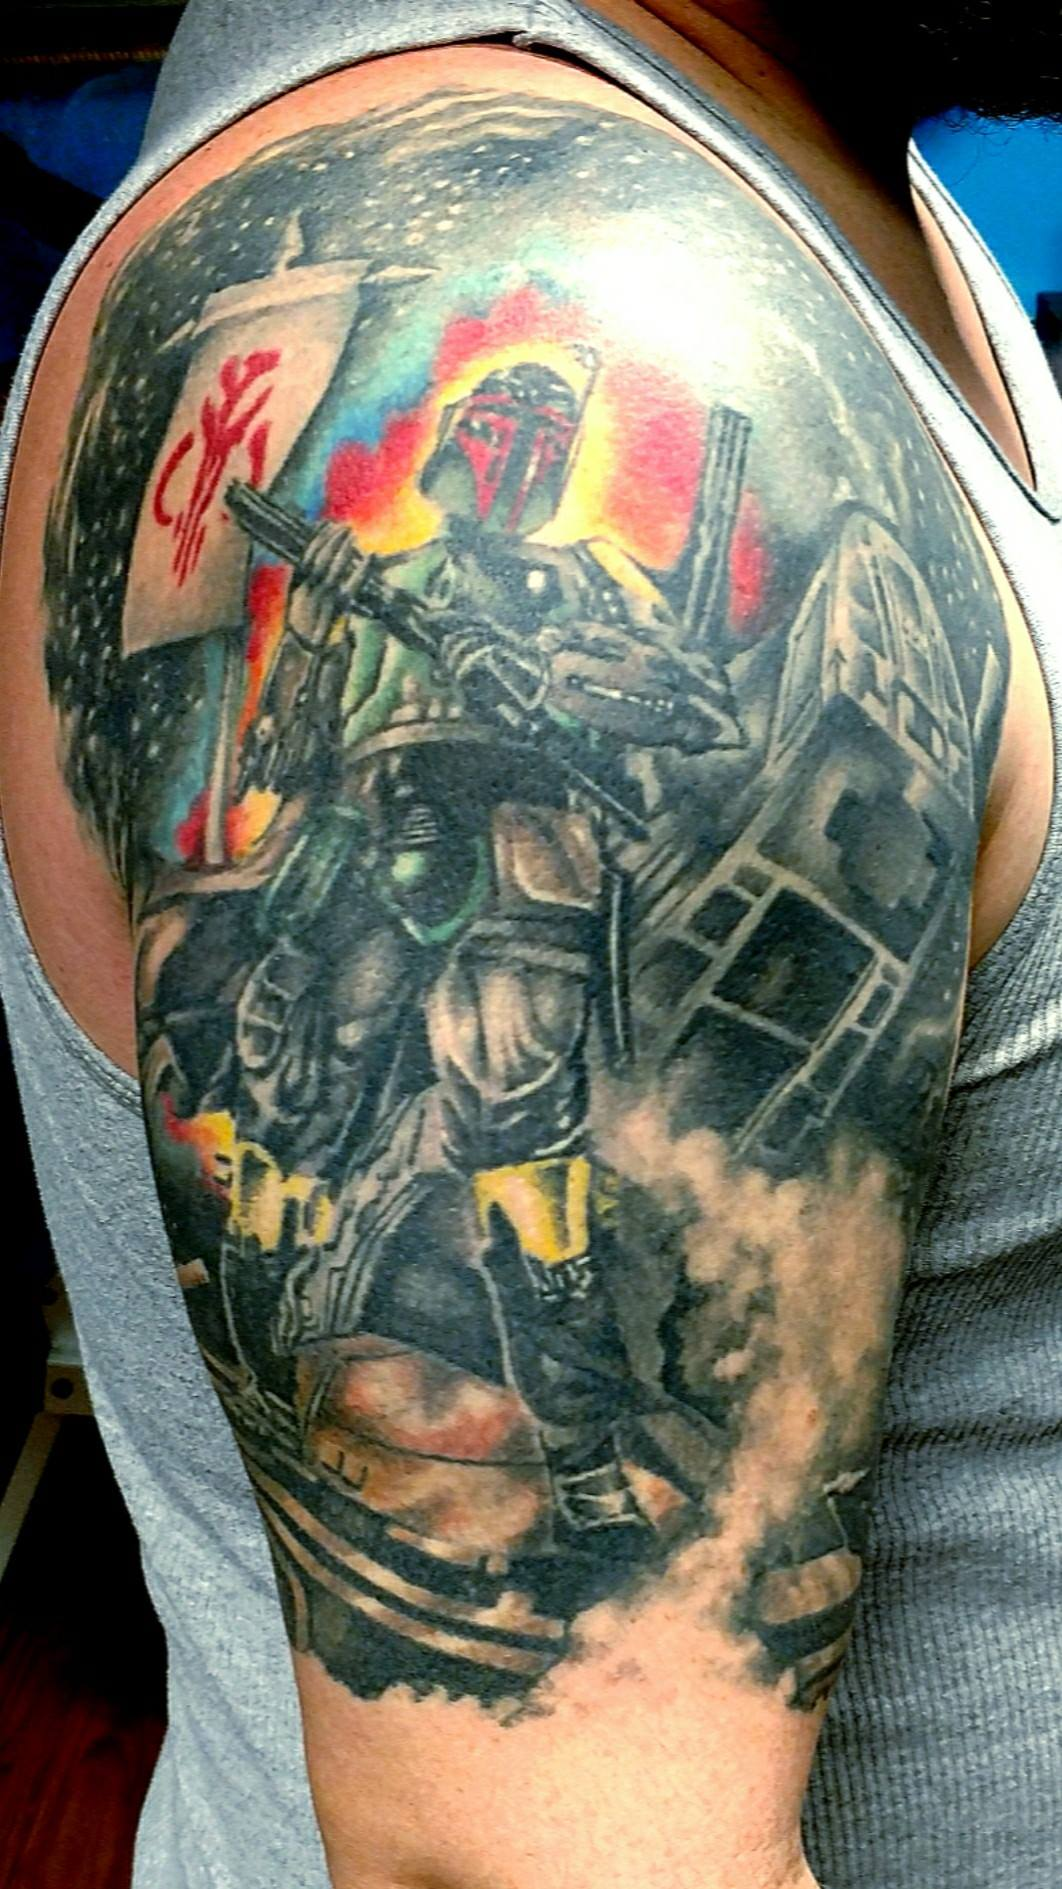 7d6c09805b4b8 Headless Hands Custom Tattoo Shop | Kansas City Tattoos